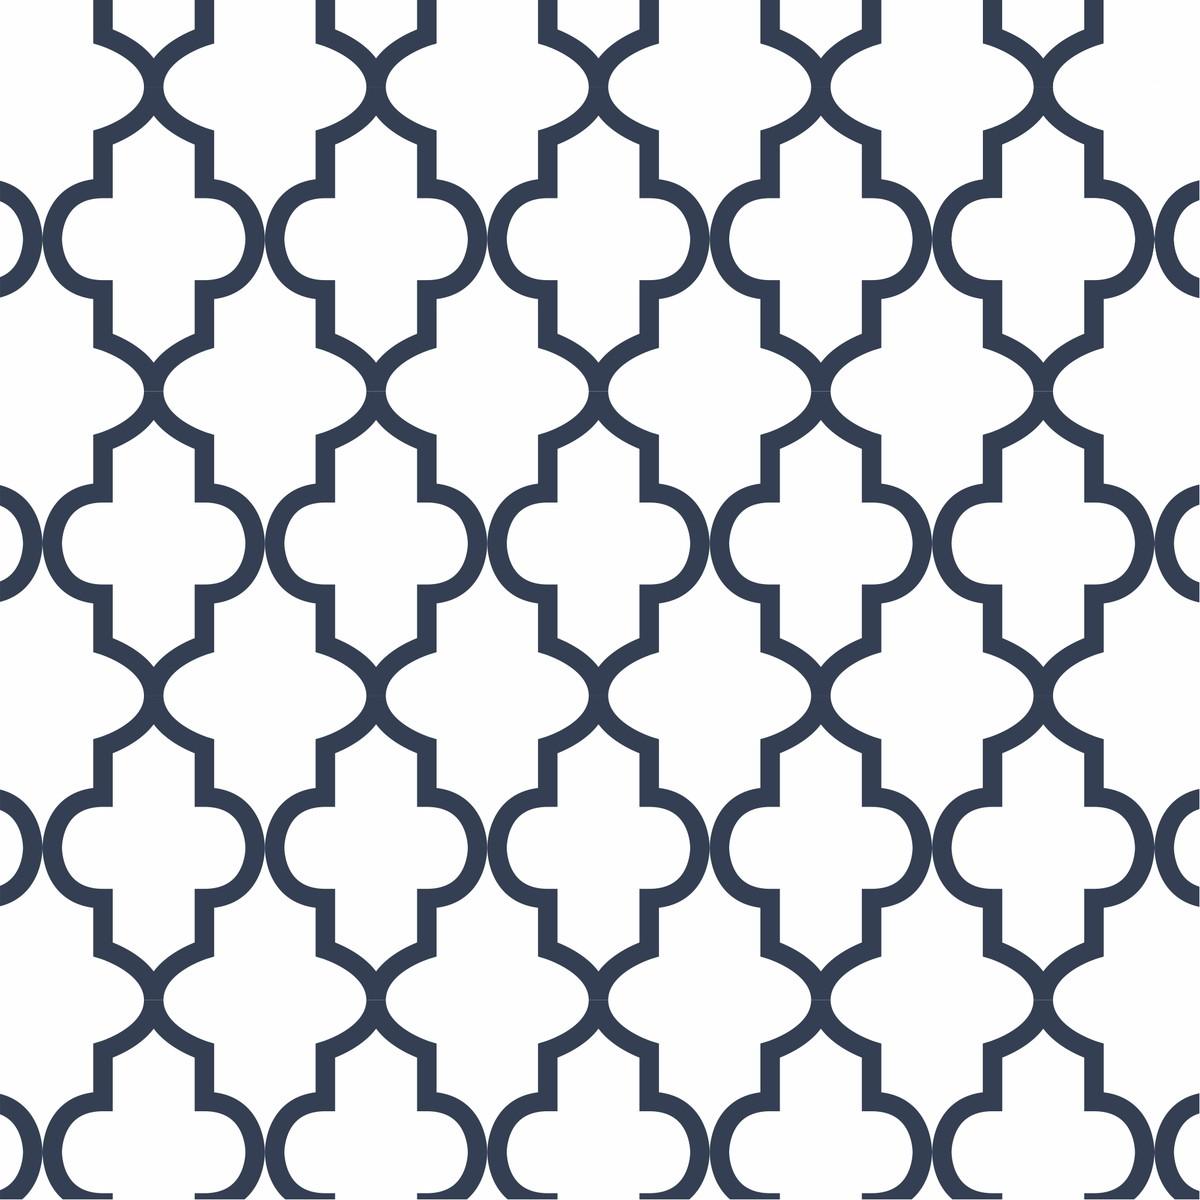 Adesivo Papel De Parede Geometrico Azul Branco Escolha Cor